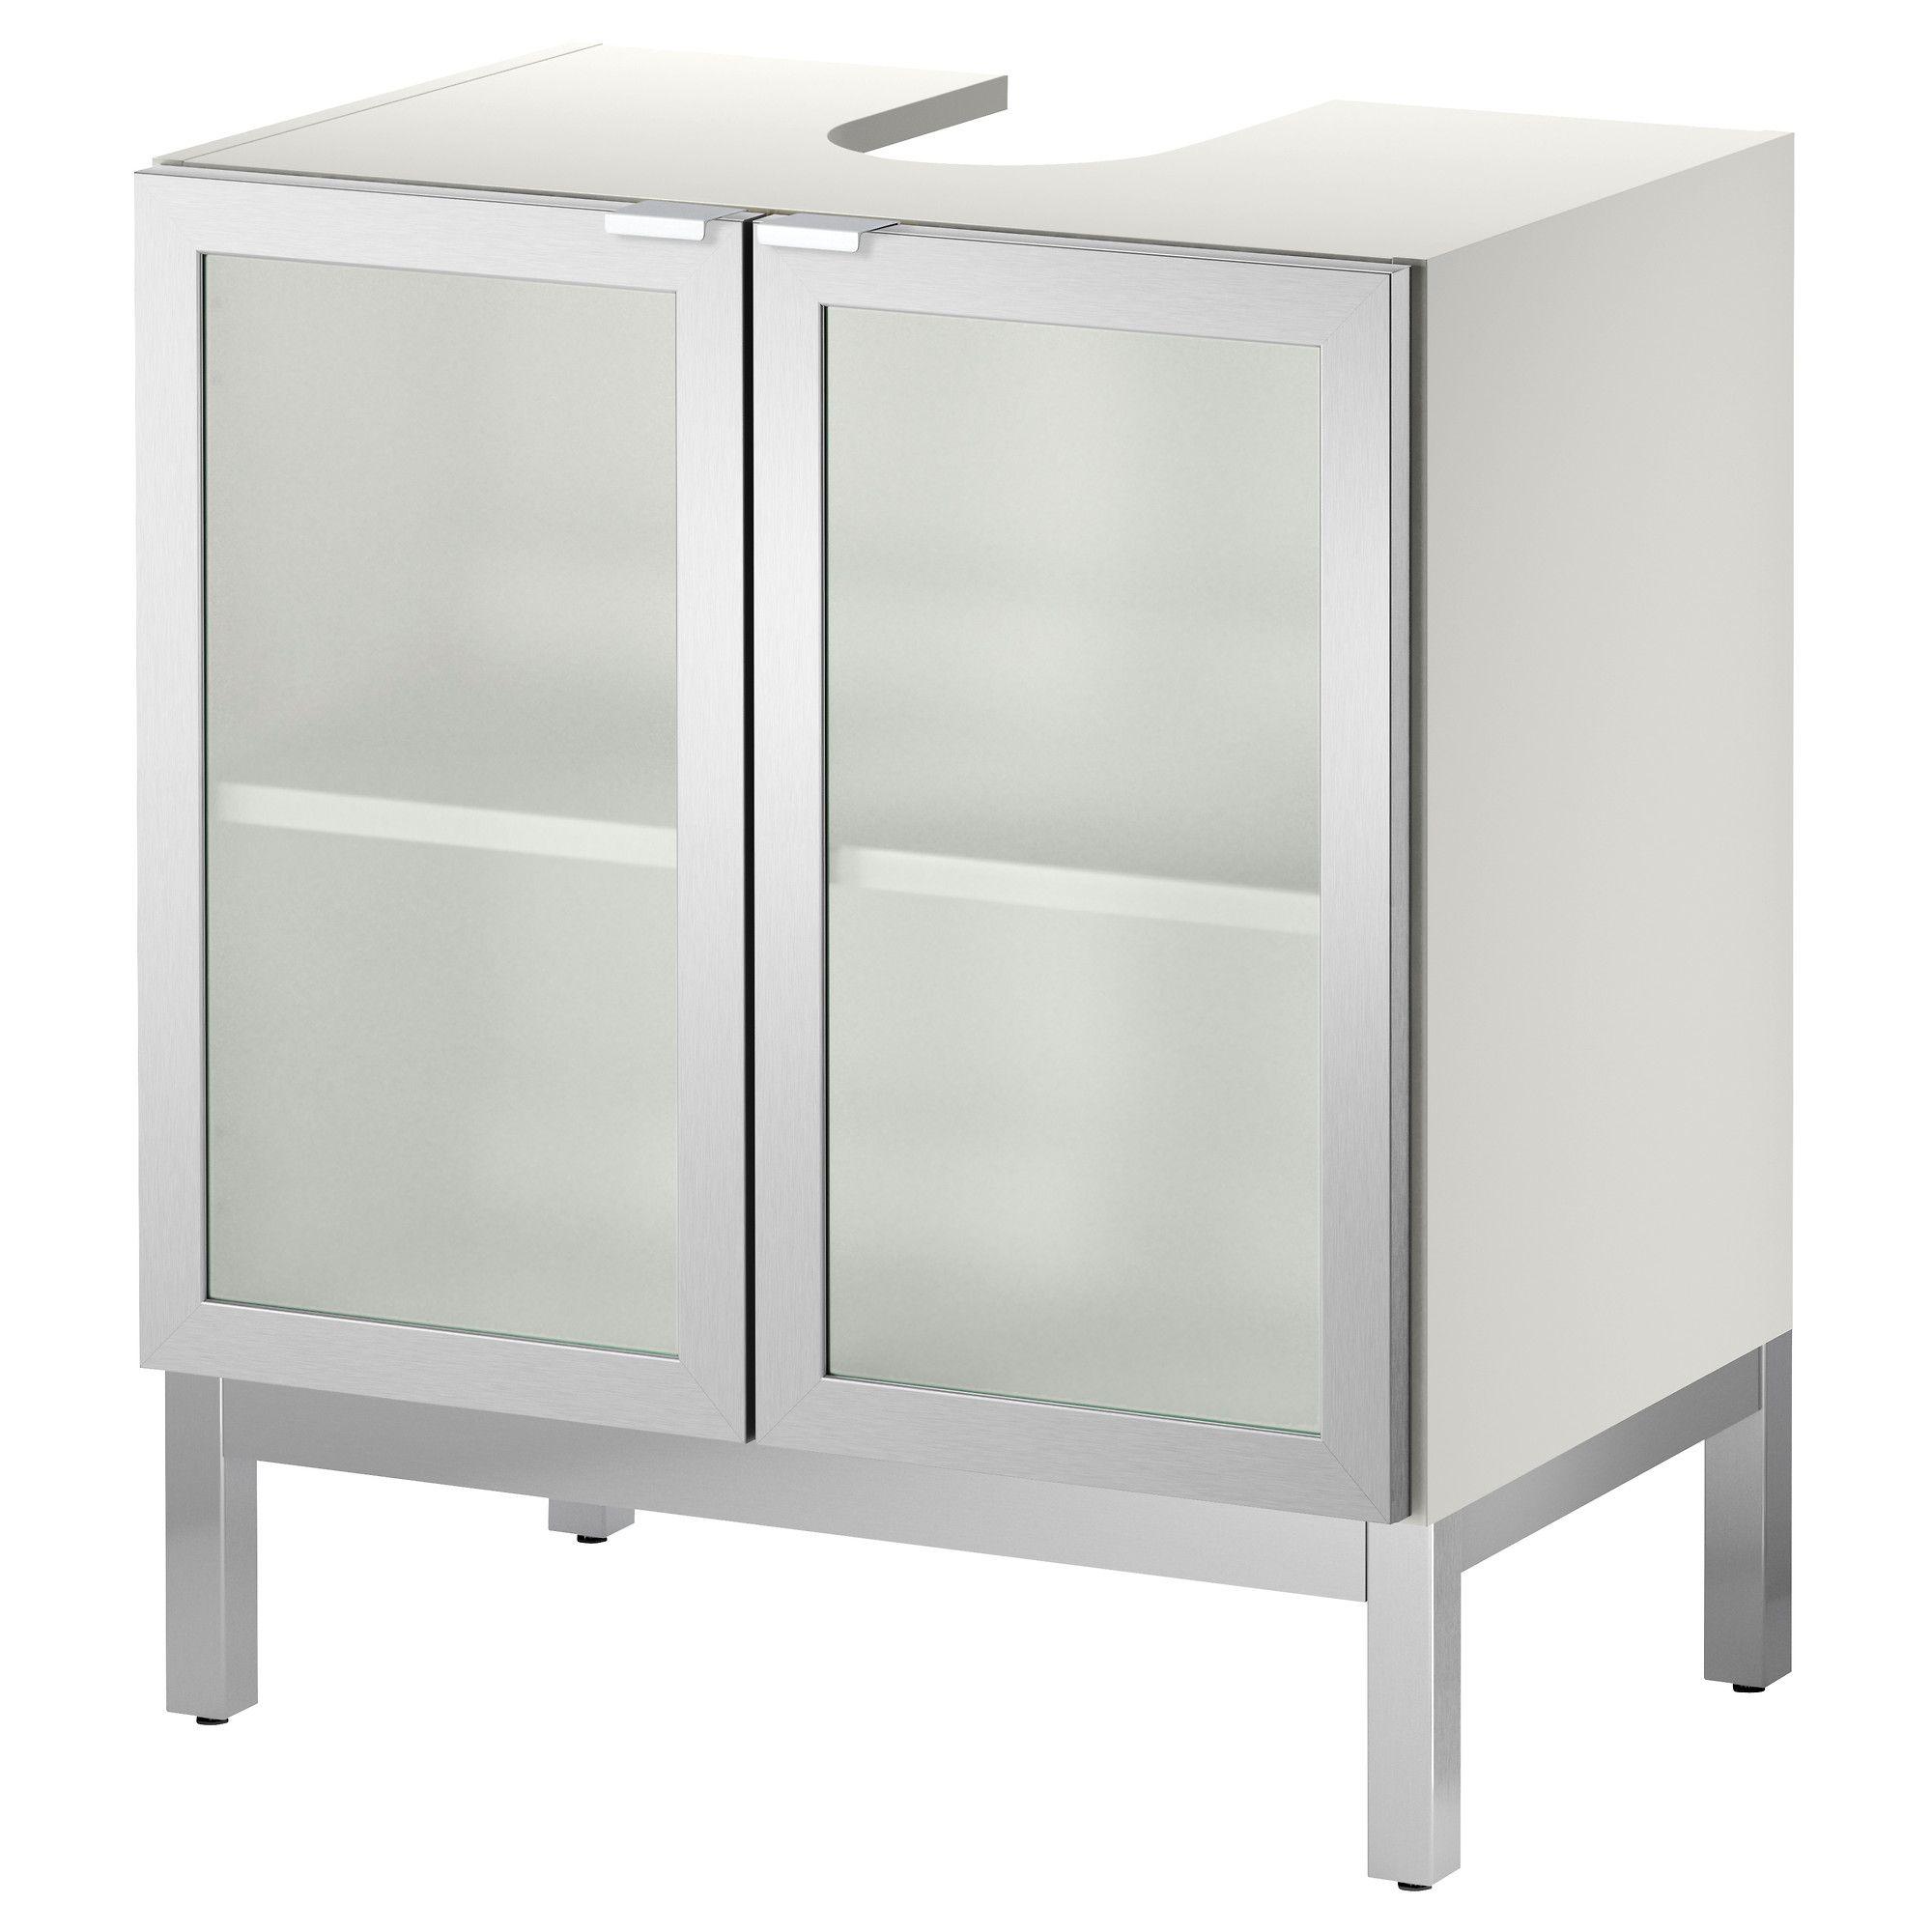 Lill Ngen Sink Base Cabinet With 2 Door